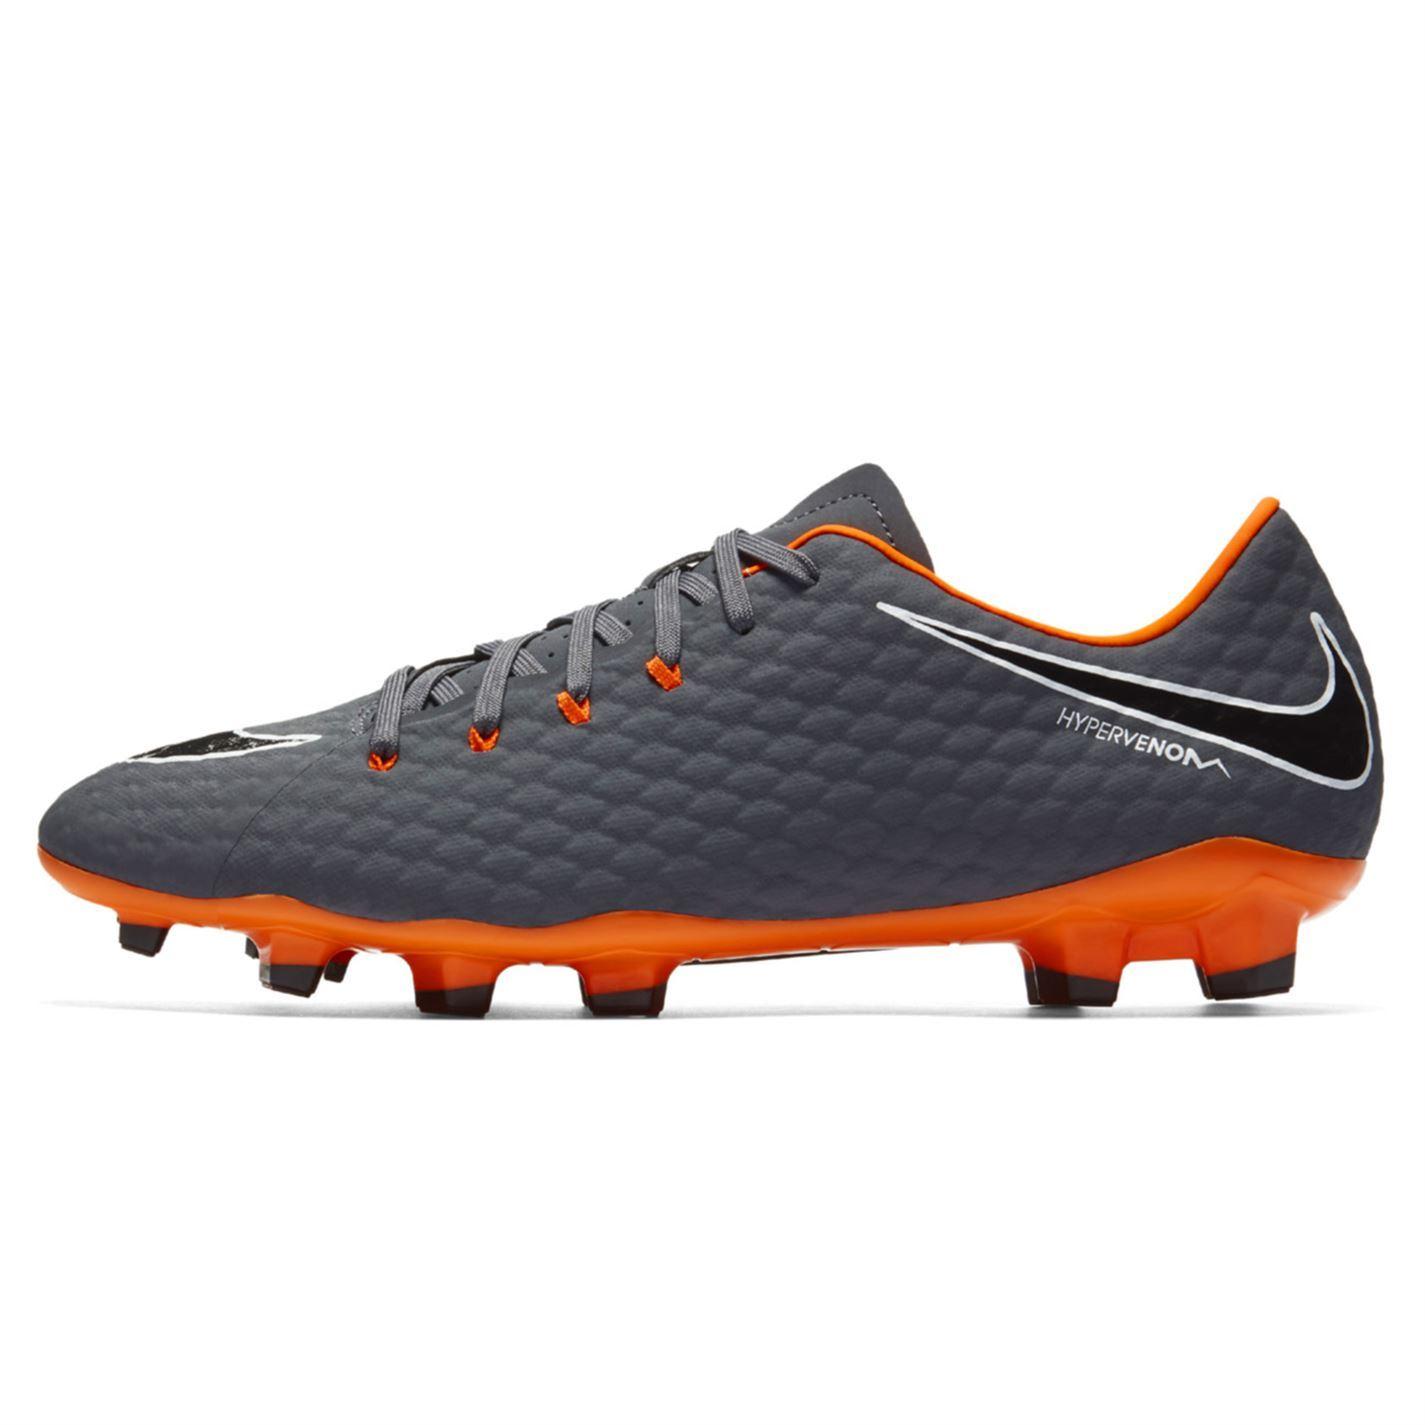 best service 20e64 f26dc ... Nike Hypervenom Phantom Accademia terra Football Boots Mens Gry calcio  tacchetta ...